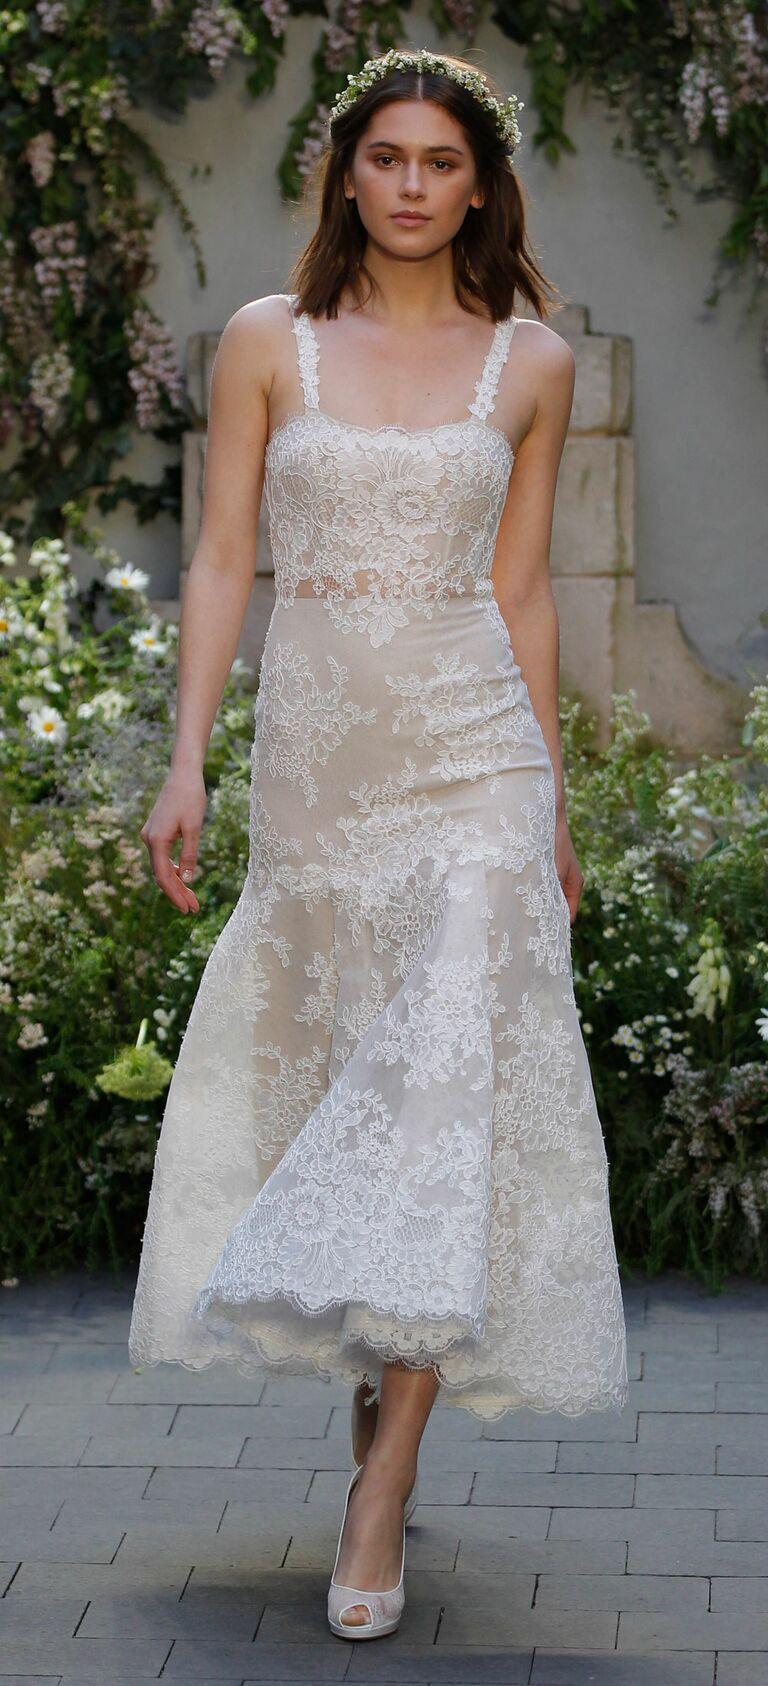 Wedding Dresses For Elopement : Wedding dresses perfect for an elopement